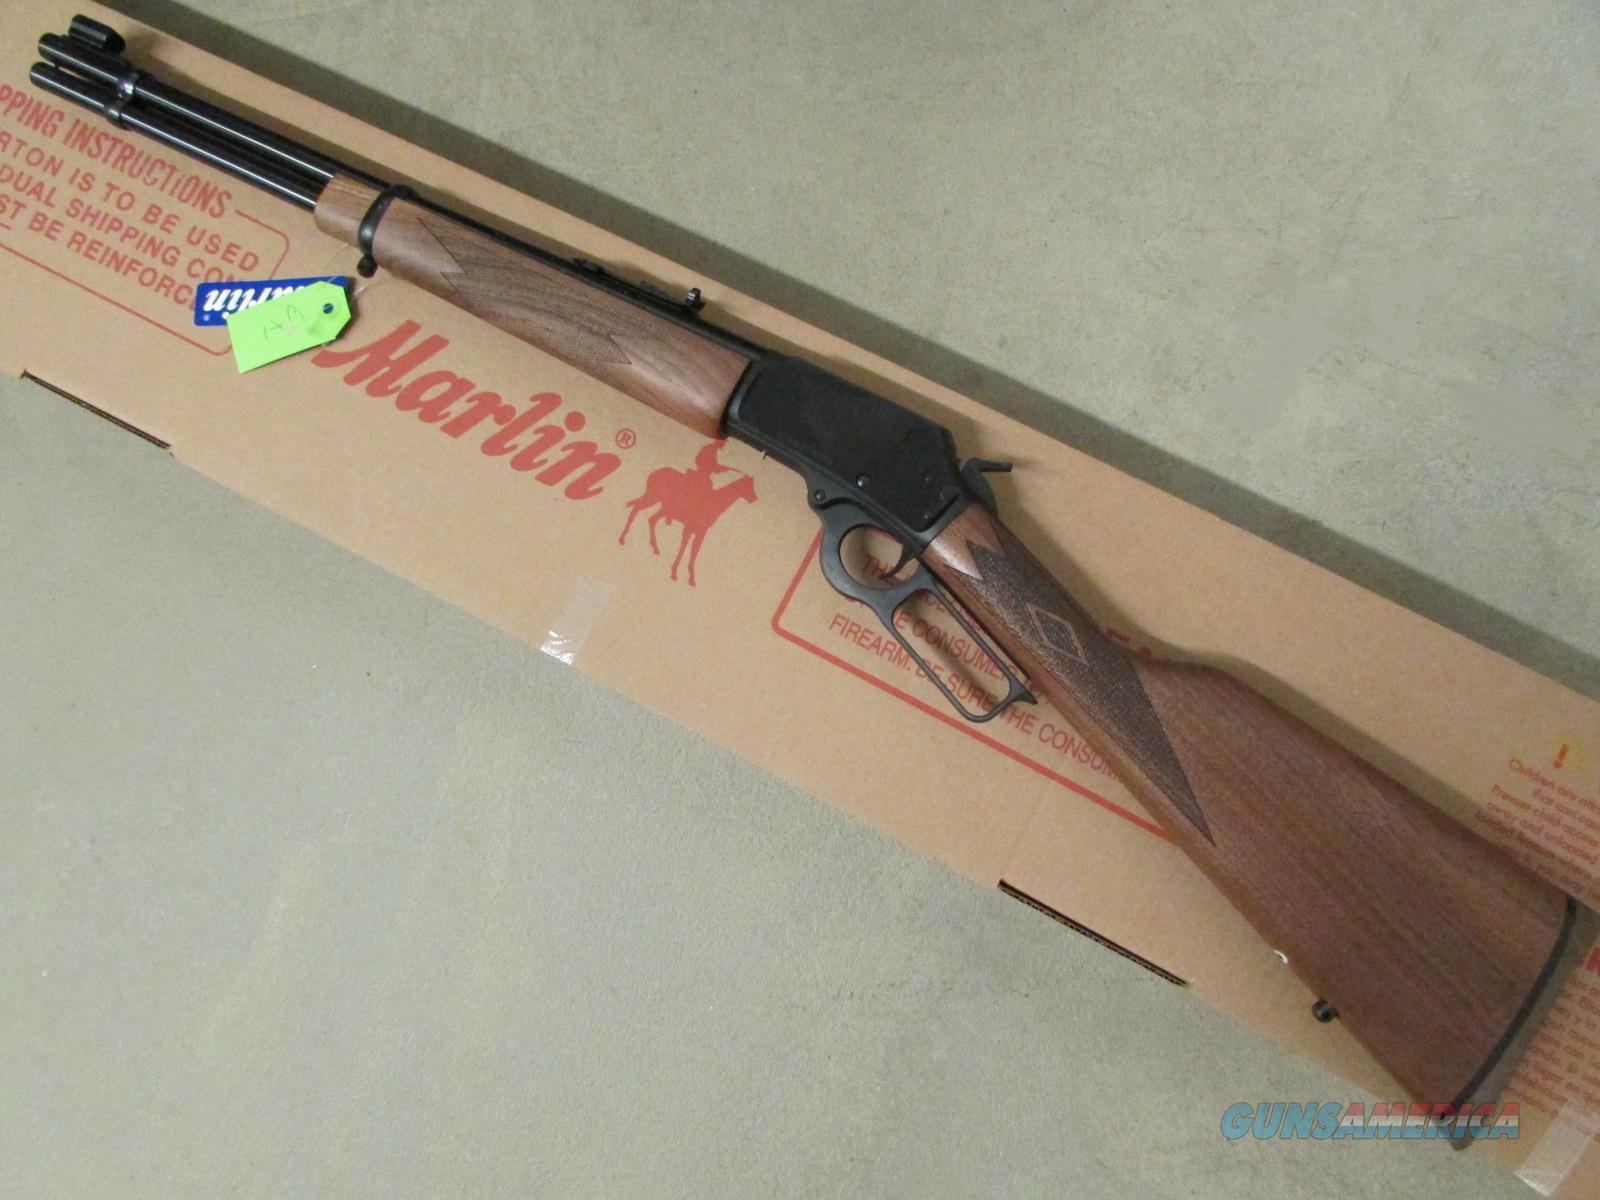 Marlin model 1894c lever action 357 mag 38 spl for sale 907705154